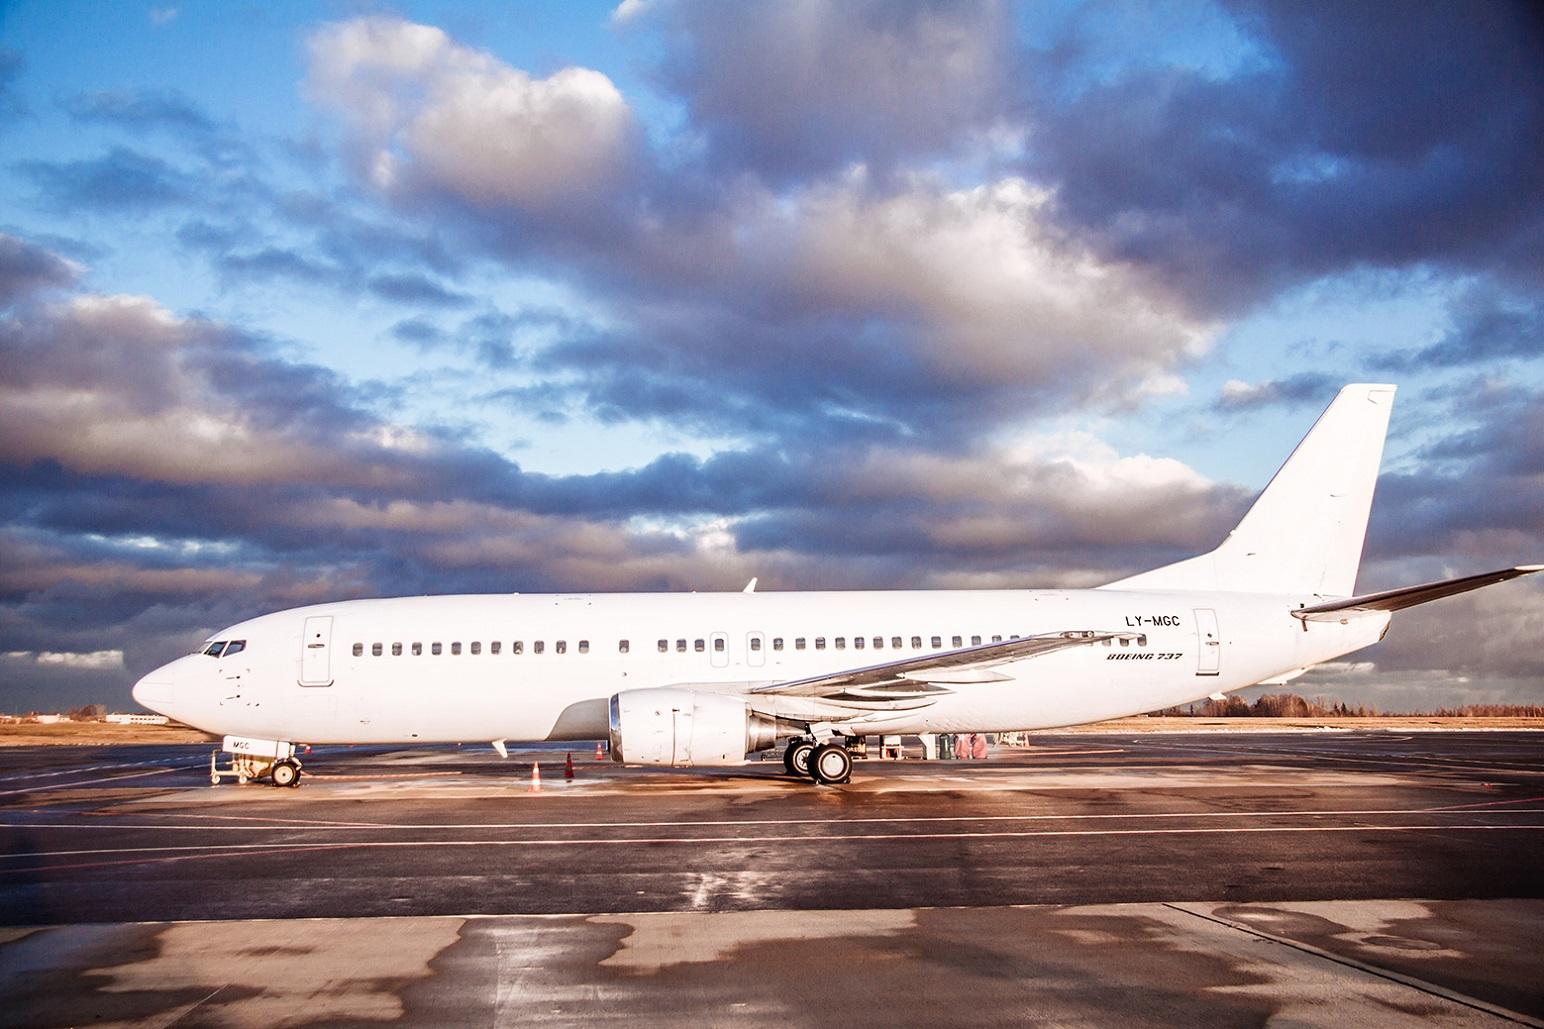 ACC Aviation transacts Boeing 737-400 to Frontera Flight Holdings Inc. for Aeronaves TSM, Mexico